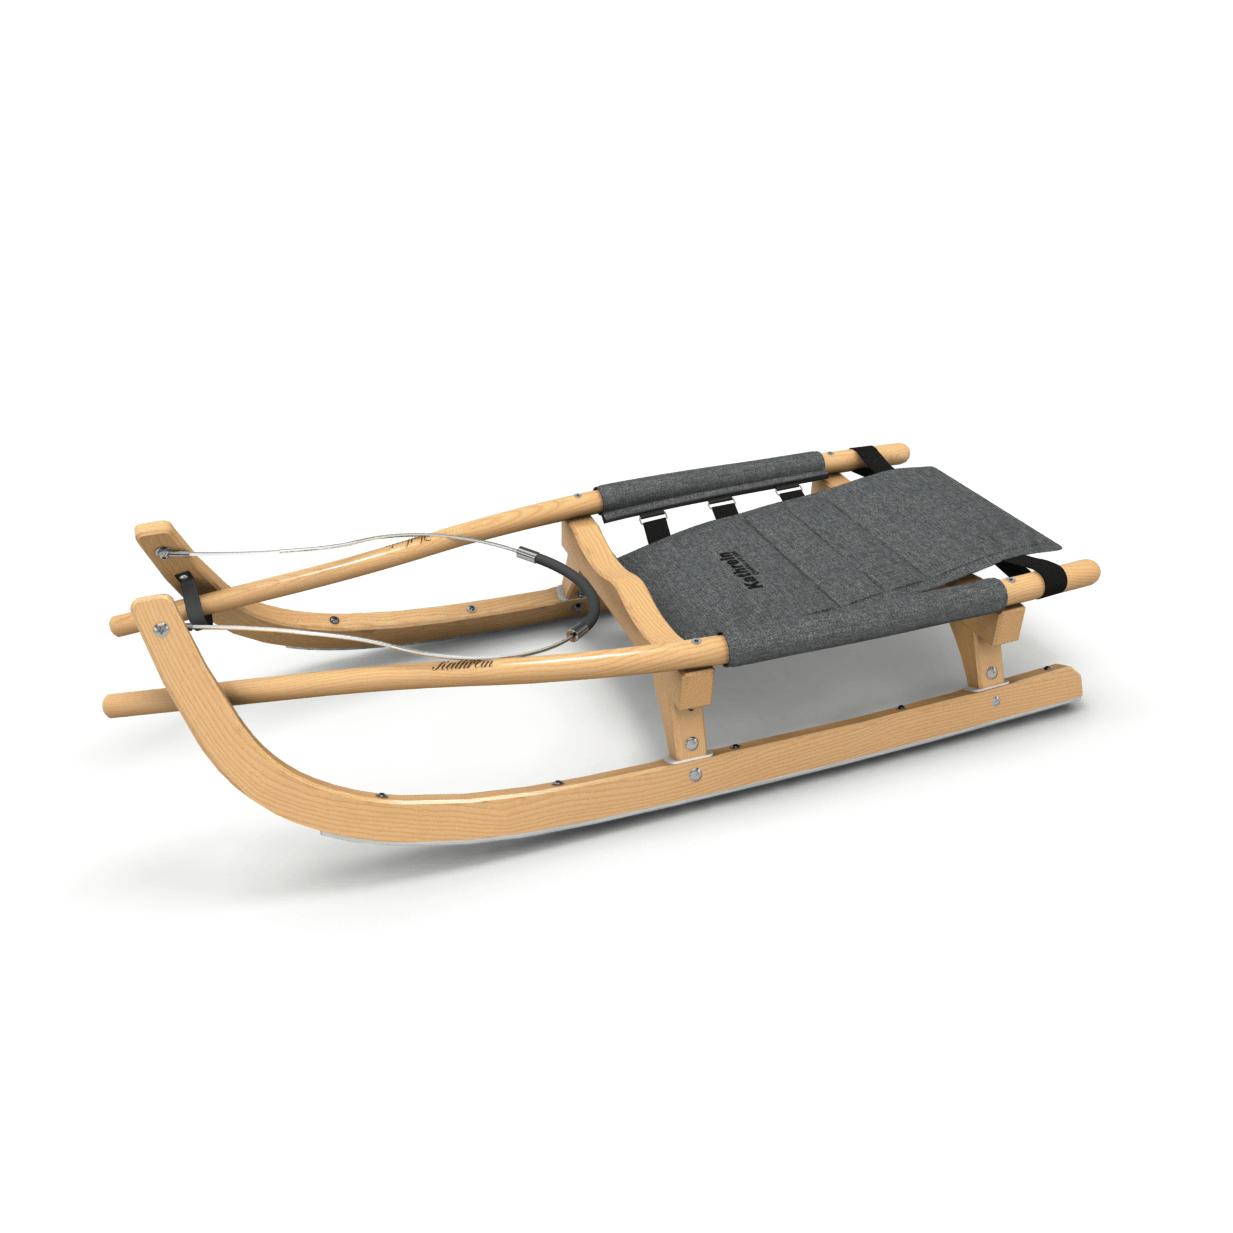 rennsportrodel einsitzer f r 1 person 160cm 190cm kathrein rodel direkt vom hersteller. Black Bedroom Furniture Sets. Home Design Ideas